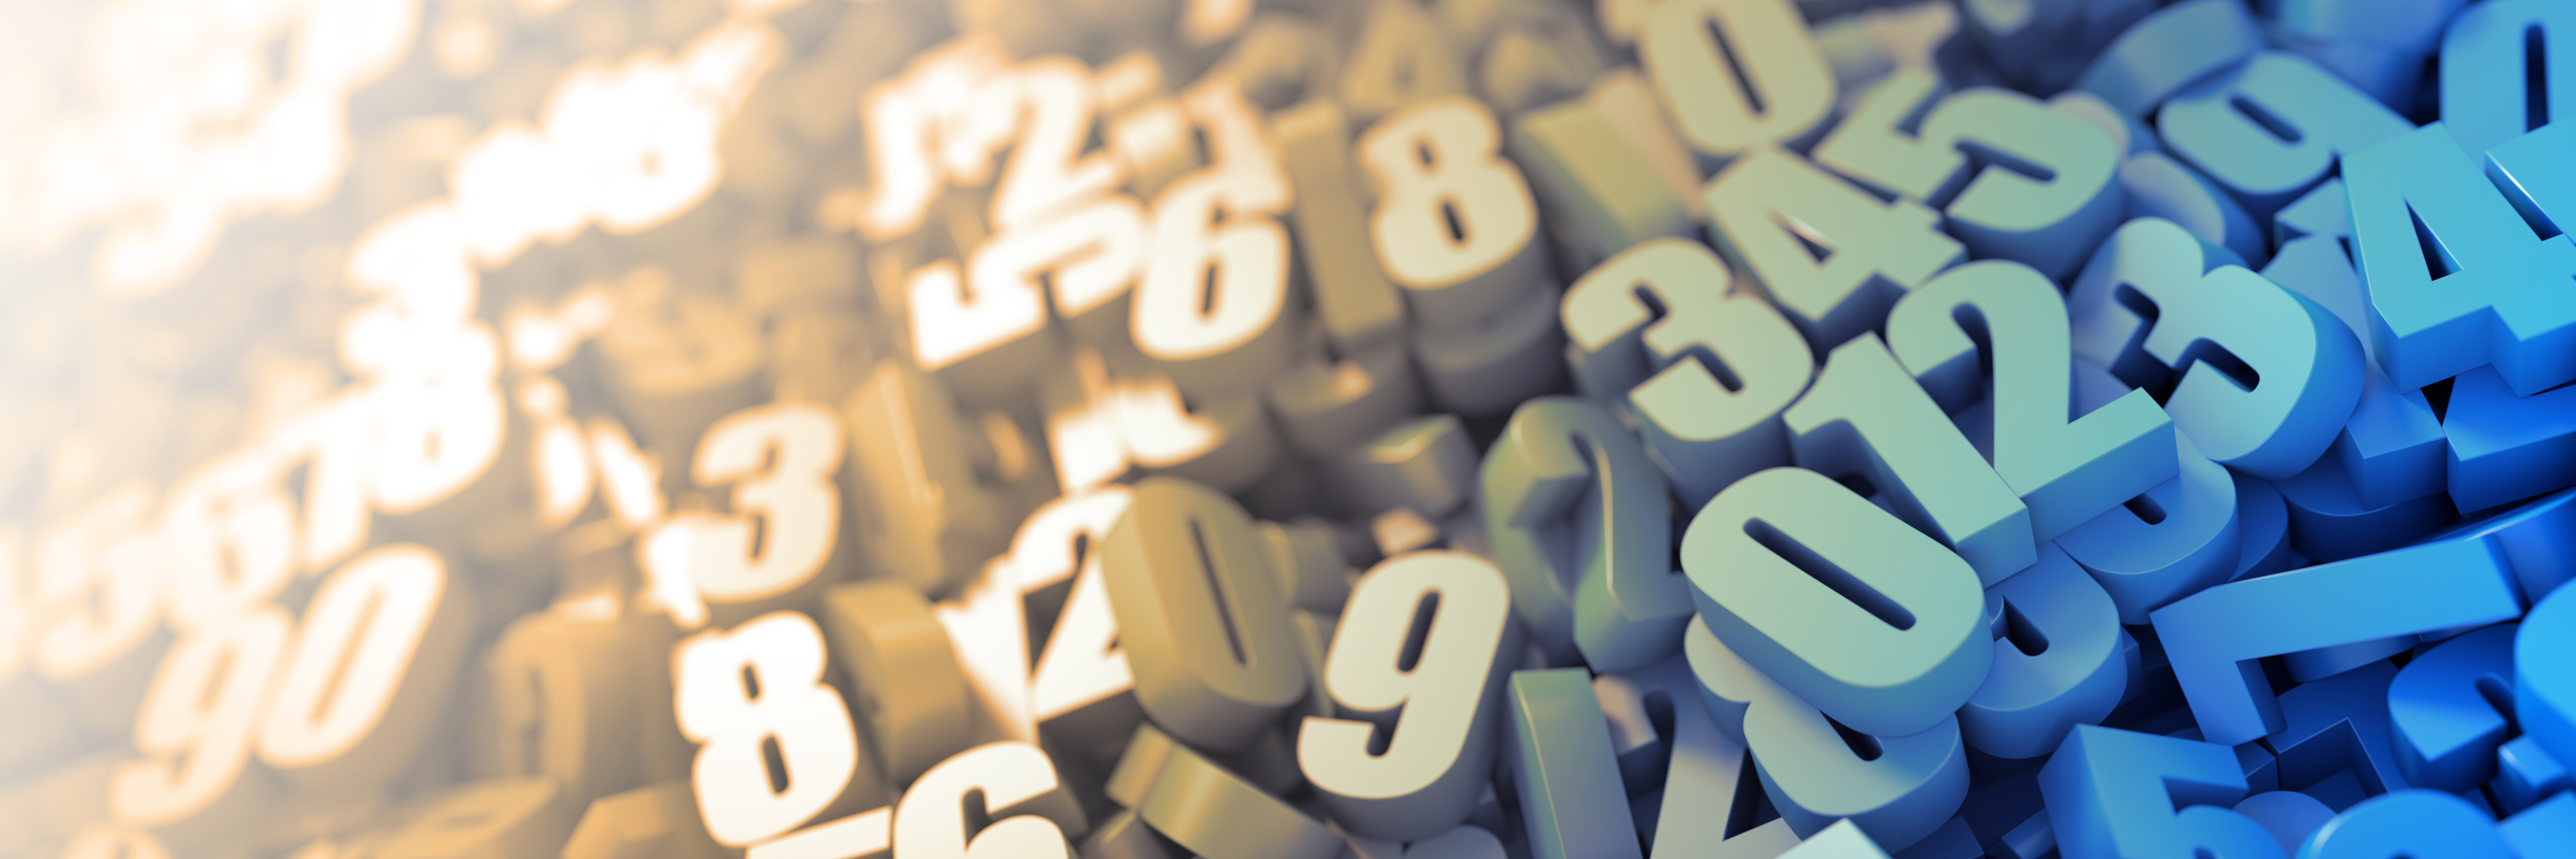 Infinite numbers background, original three dimensional models.